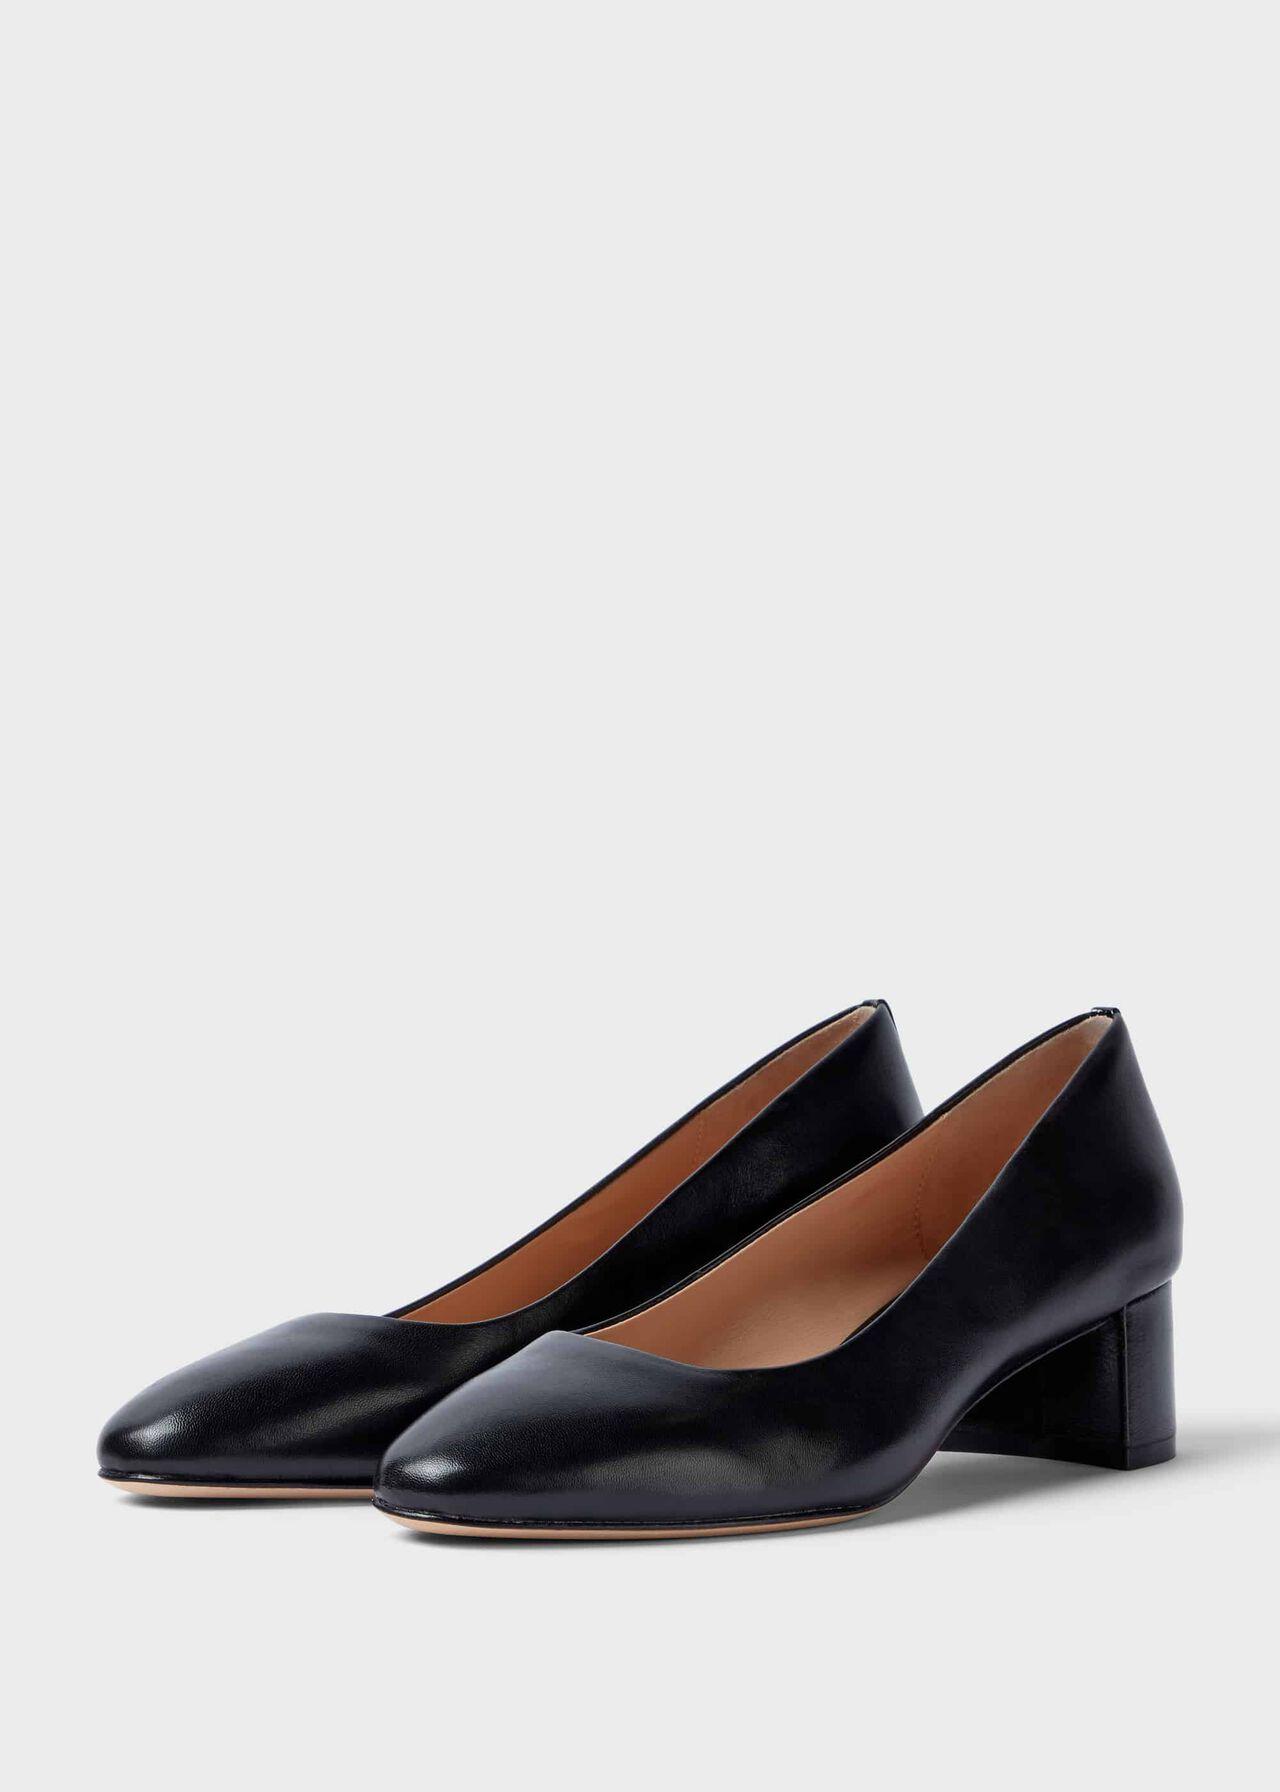 Abbey Leather Court Shoes Black